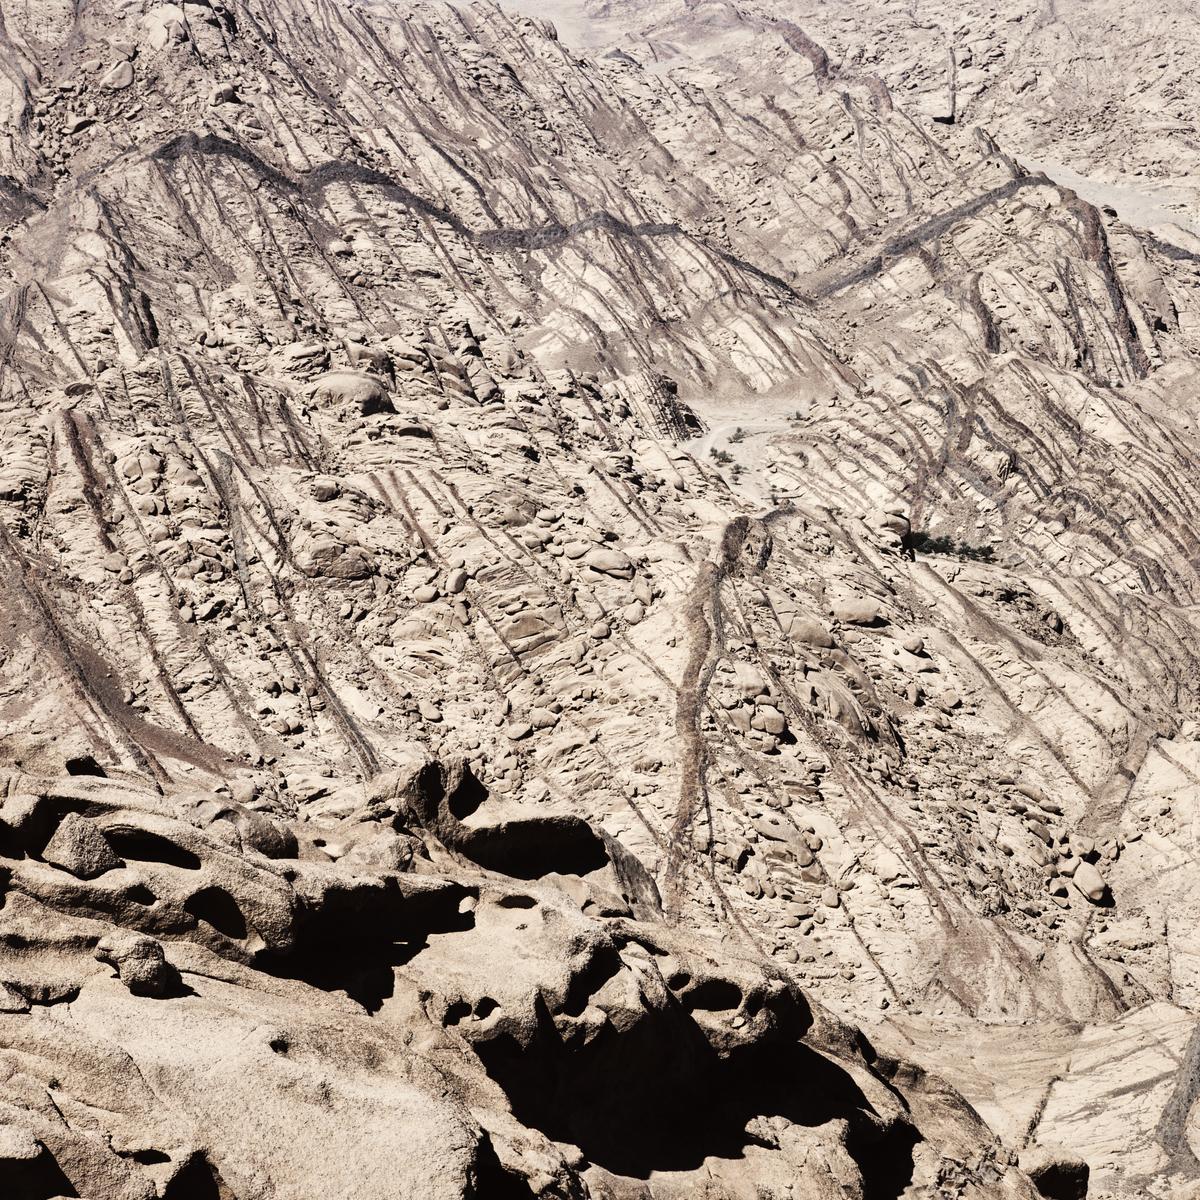 Dikes in Sinai (Wadi Natzeb)